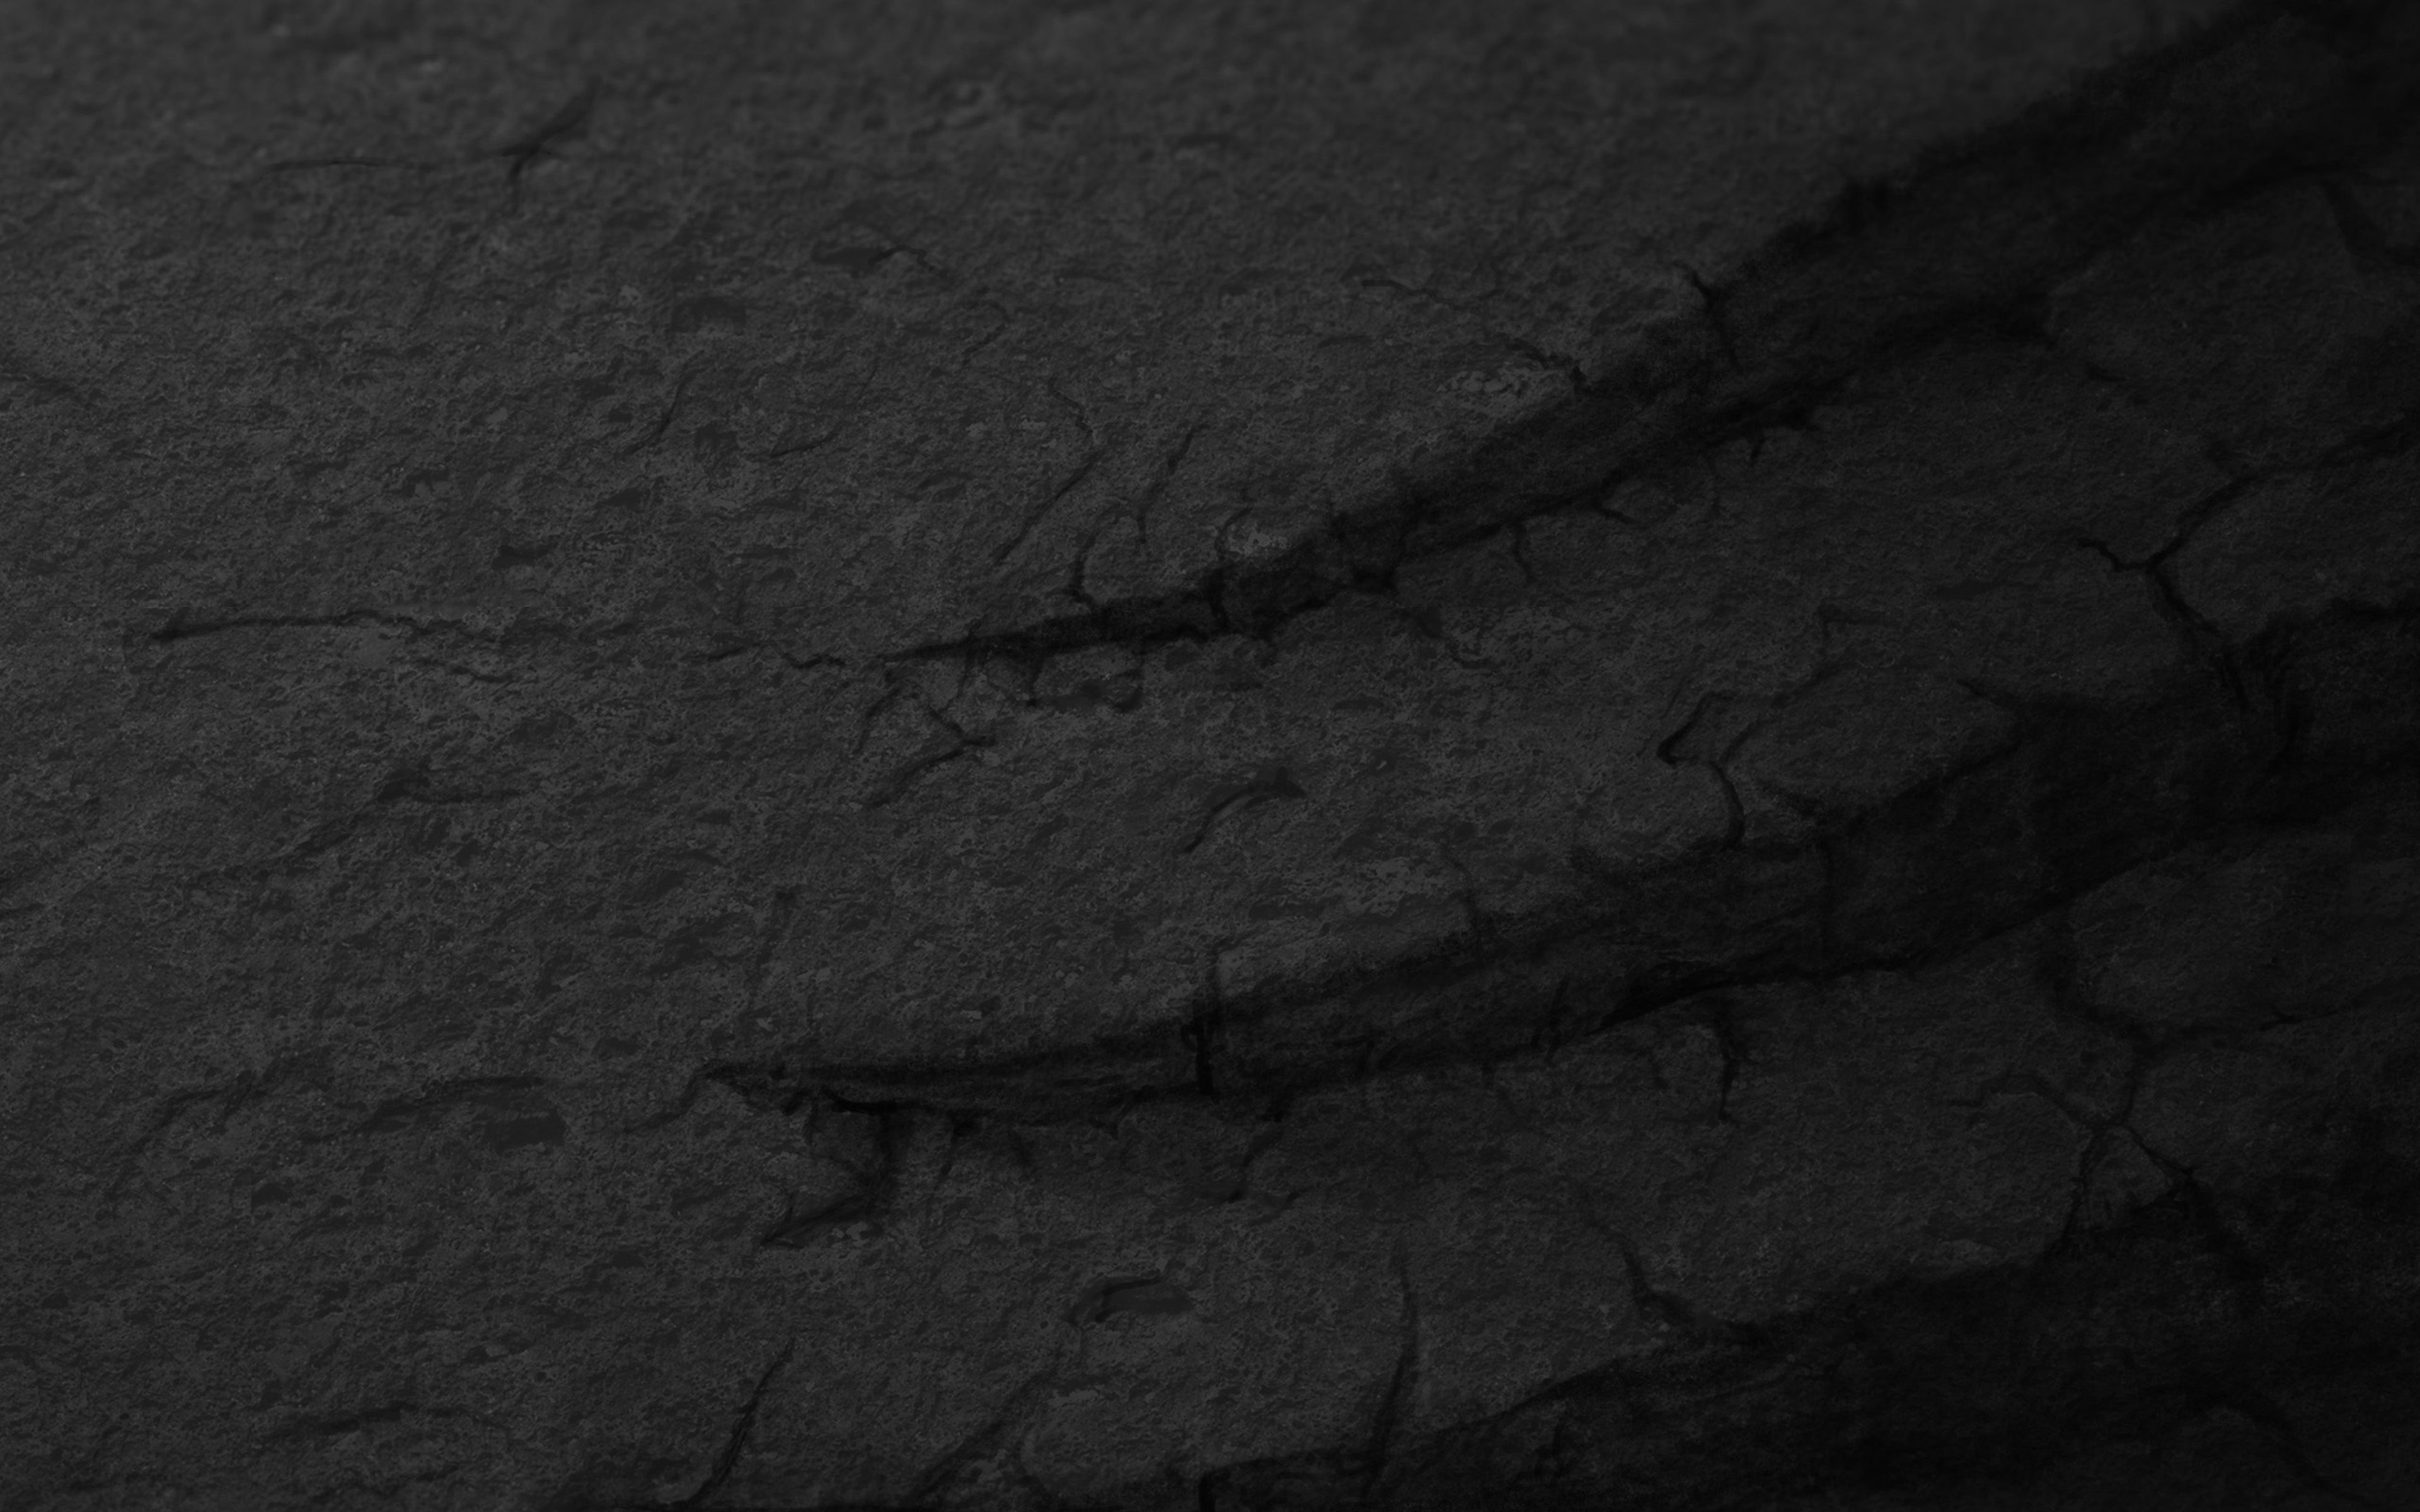 Rock Texture Wallpapers Top Free Rock Texture Backgrounds Wallpaperaccess